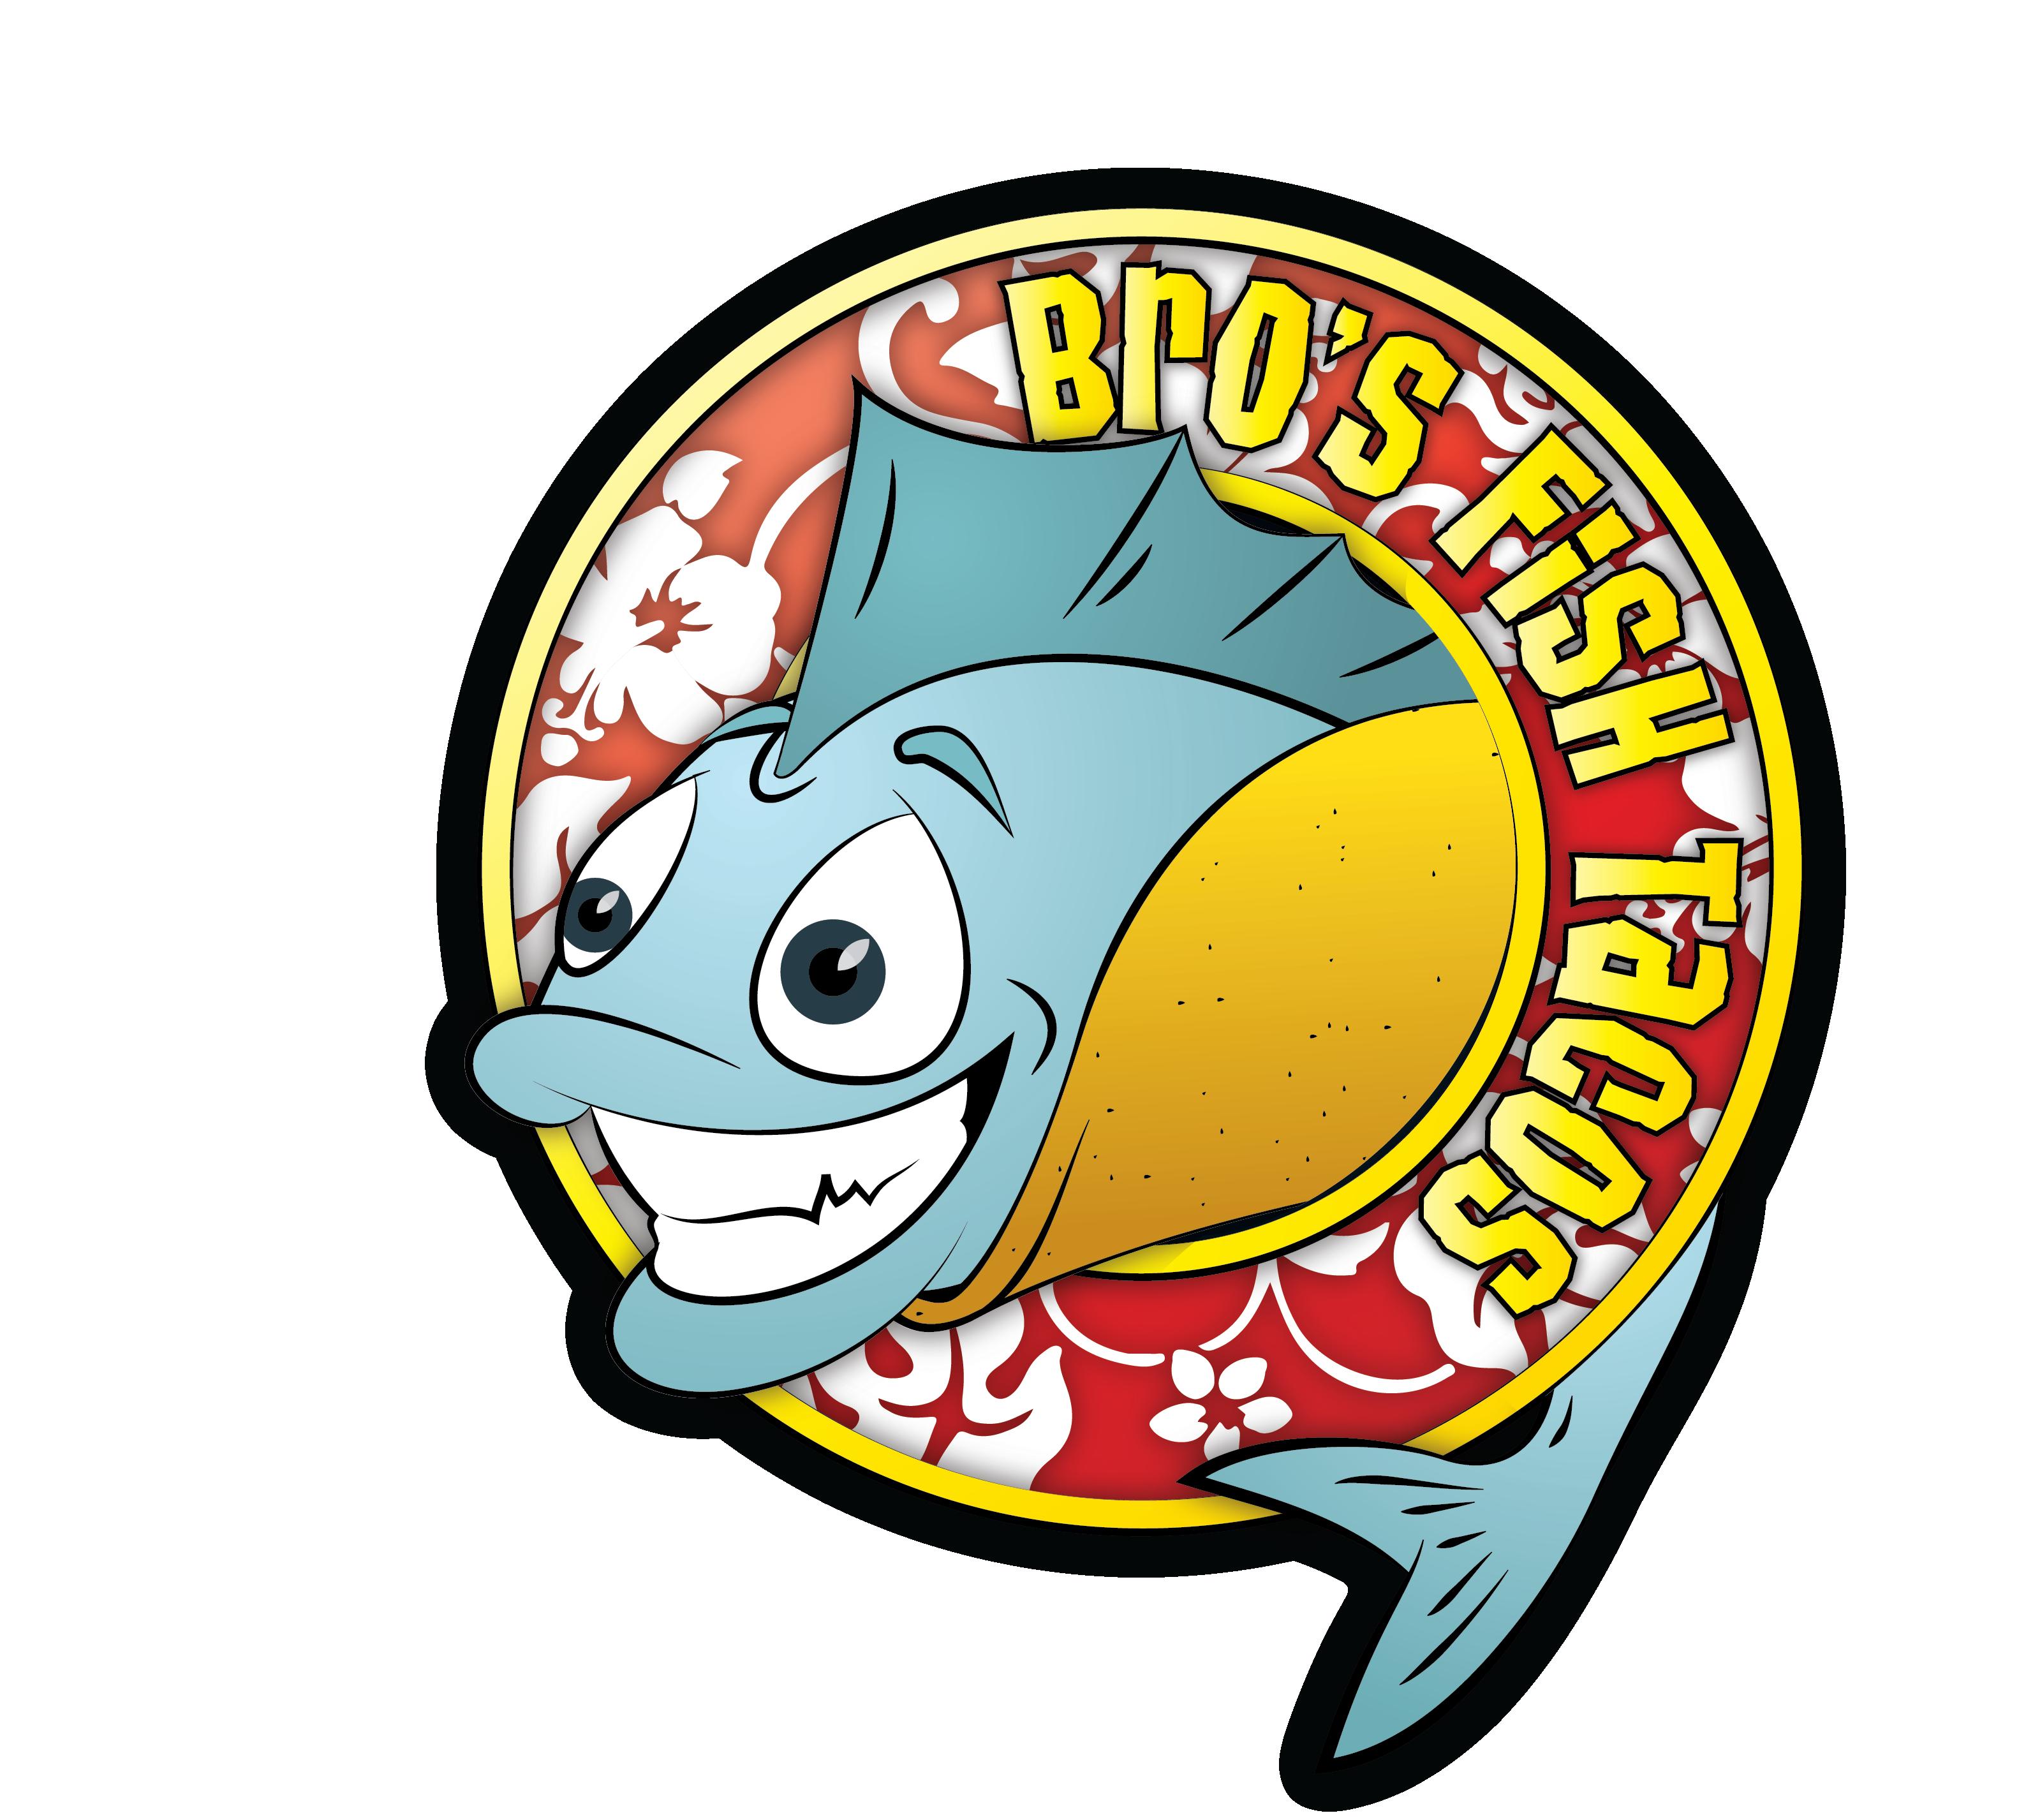 Fish taco clipart clip art free library Bro's Fish Tacos | Food Trucks In Virginia Beach VA clip art free library